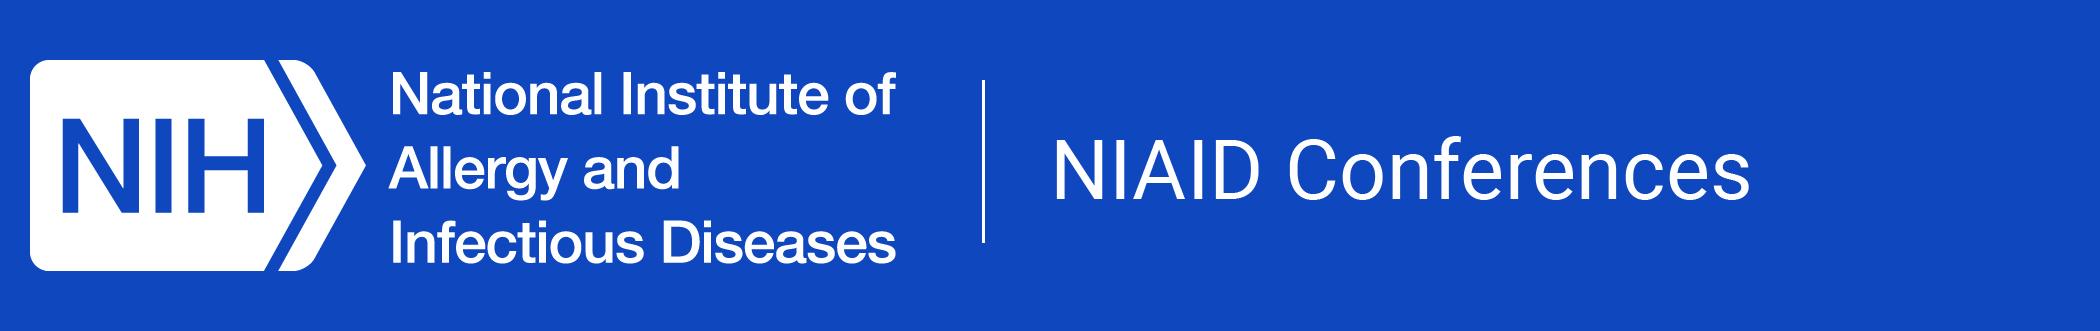 NIH-NIAID-Conferences-20558a